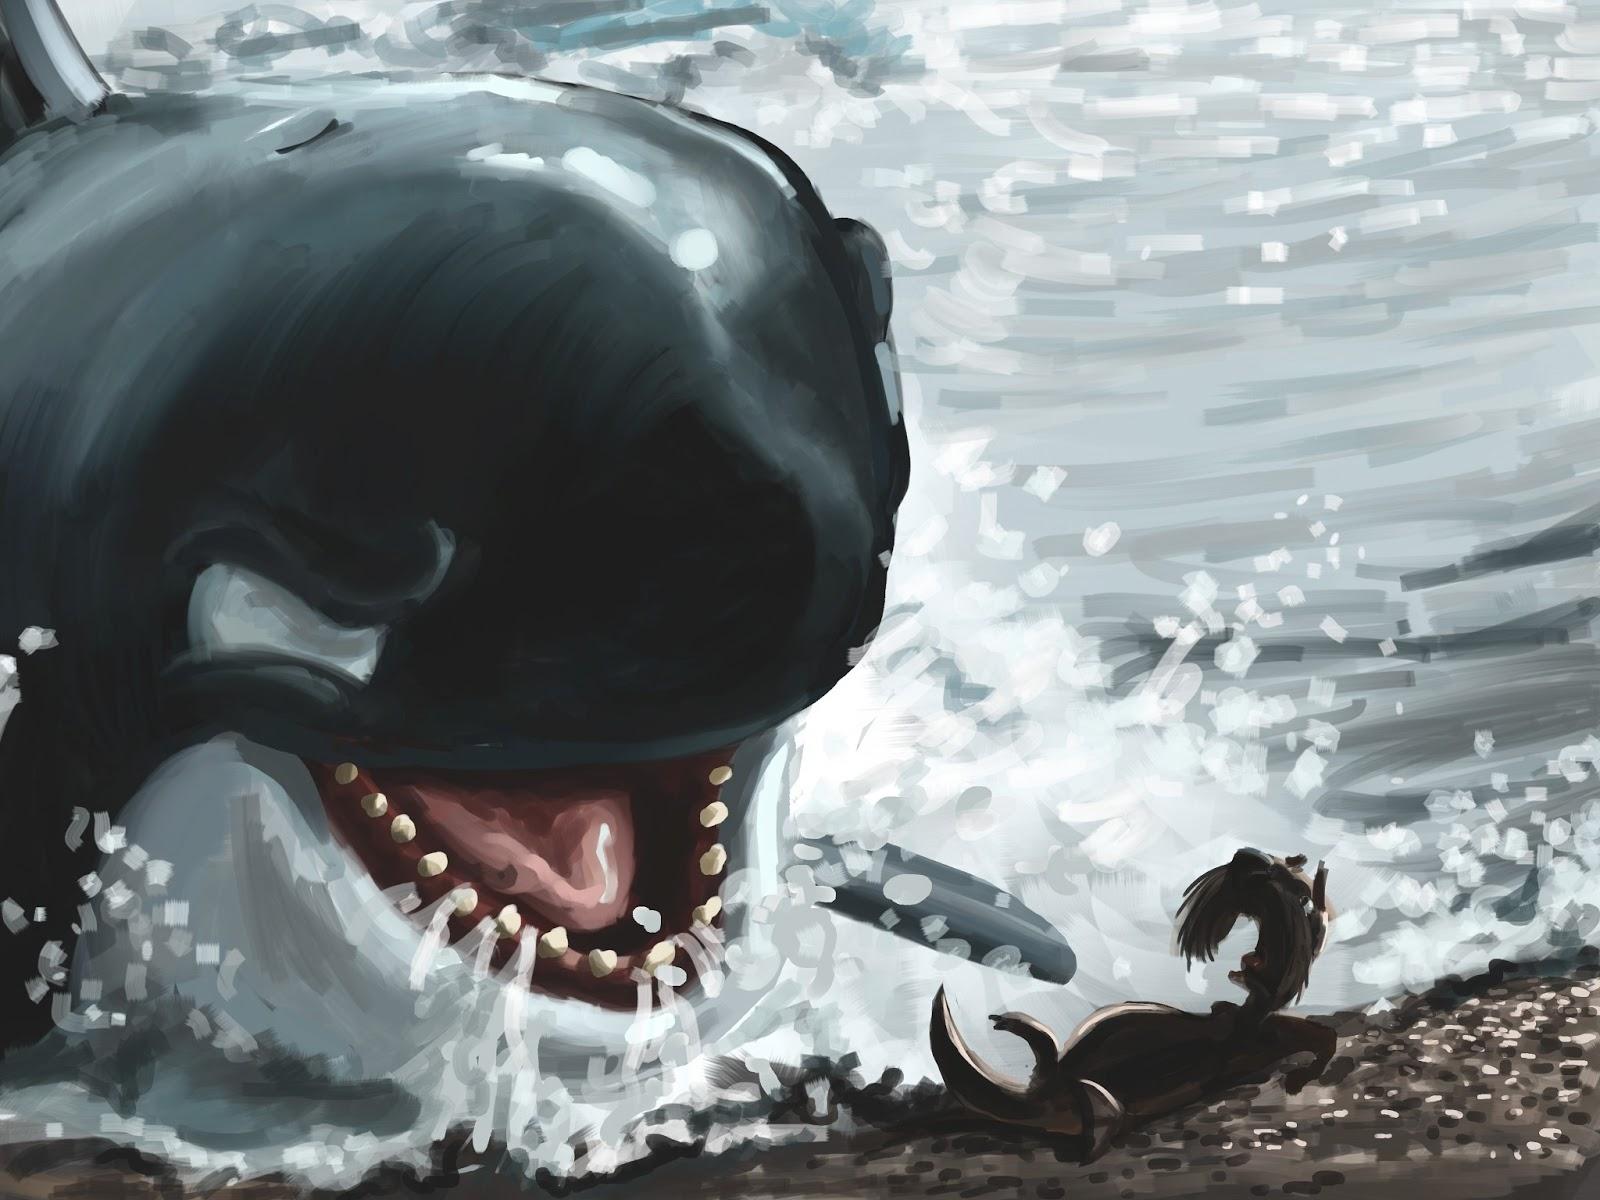 killer whale attacks - HD1600×1200